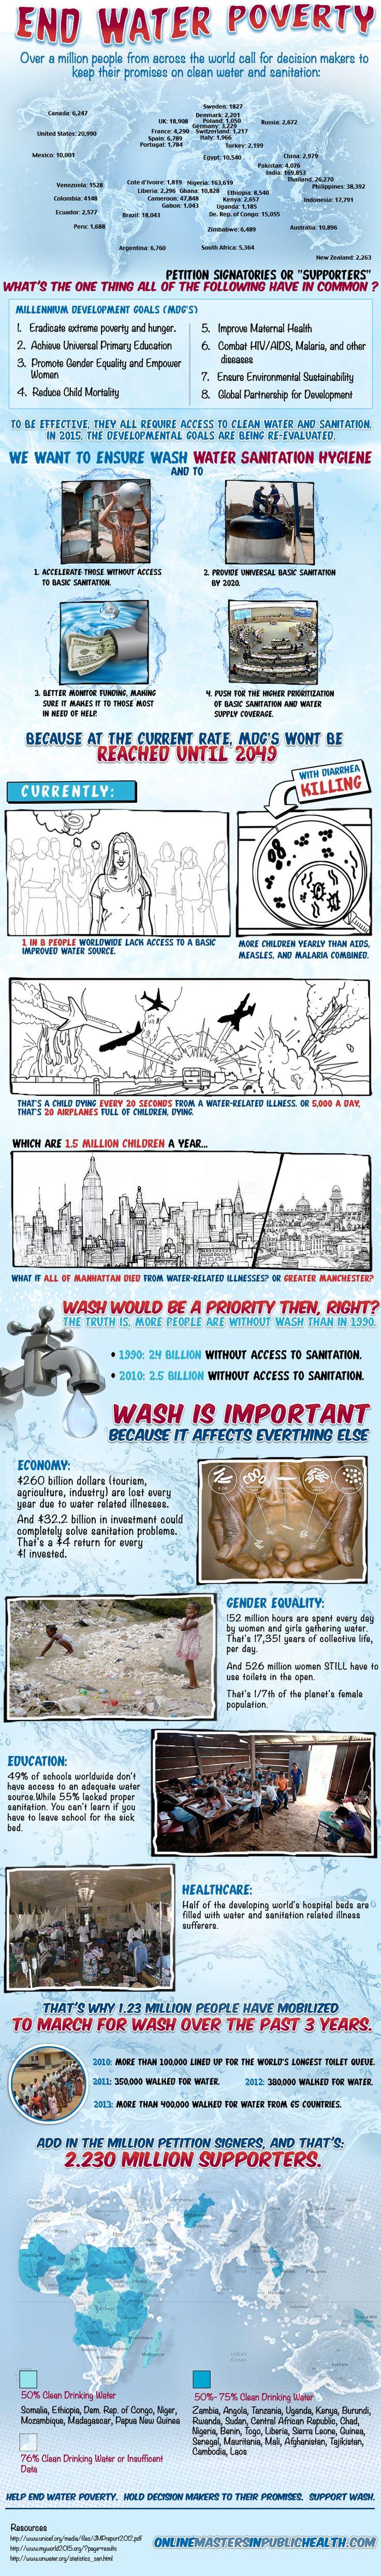 Diarrhea: advocacy resources